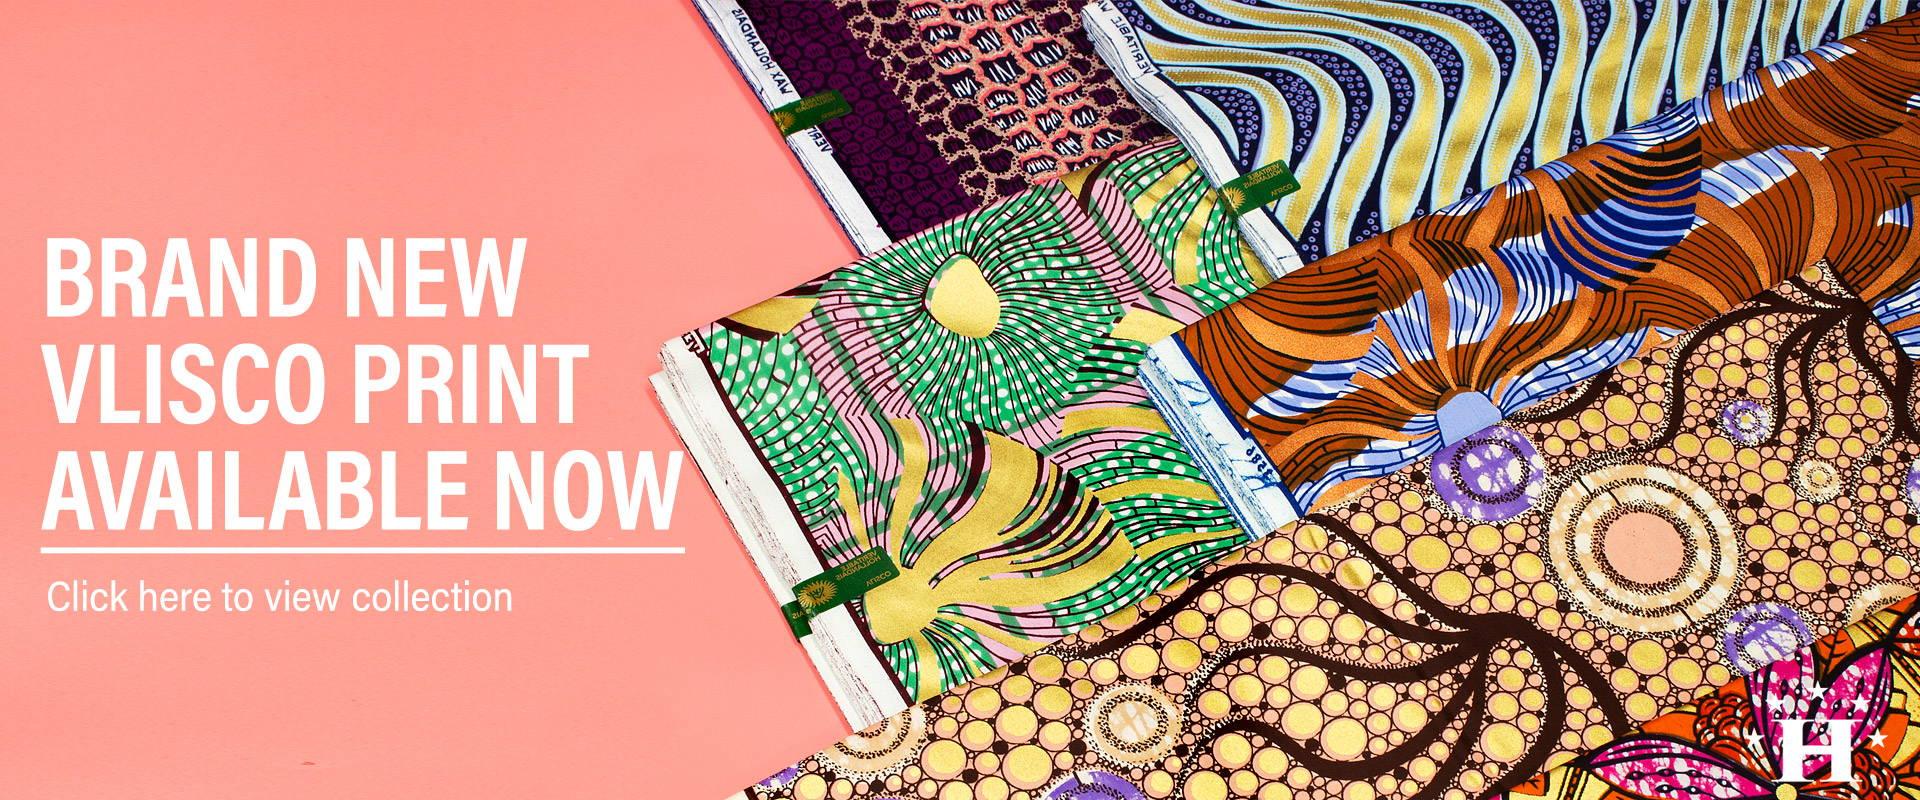 nagelneu vlisco Supergoldwachsdruck afrikanische Textilien